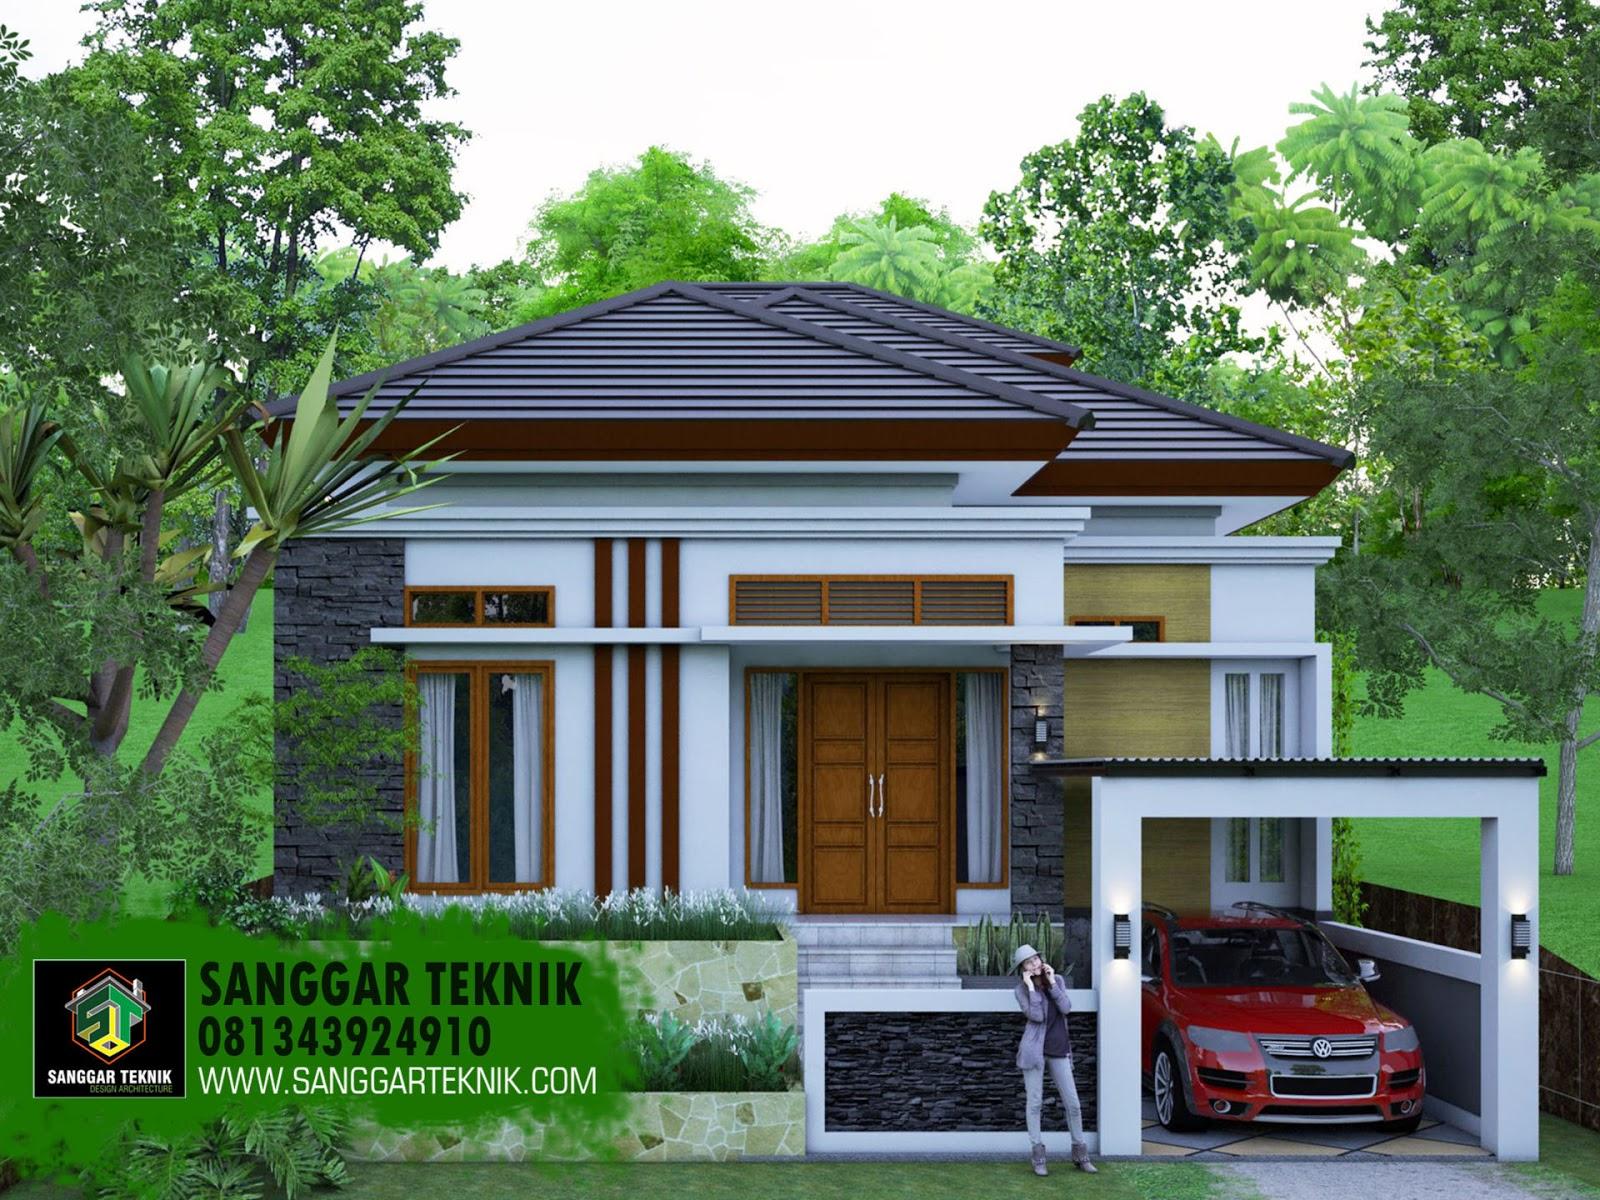 Desain Rumah Modern 10x 20 2 Lantai 2020 Sanggar Teknik